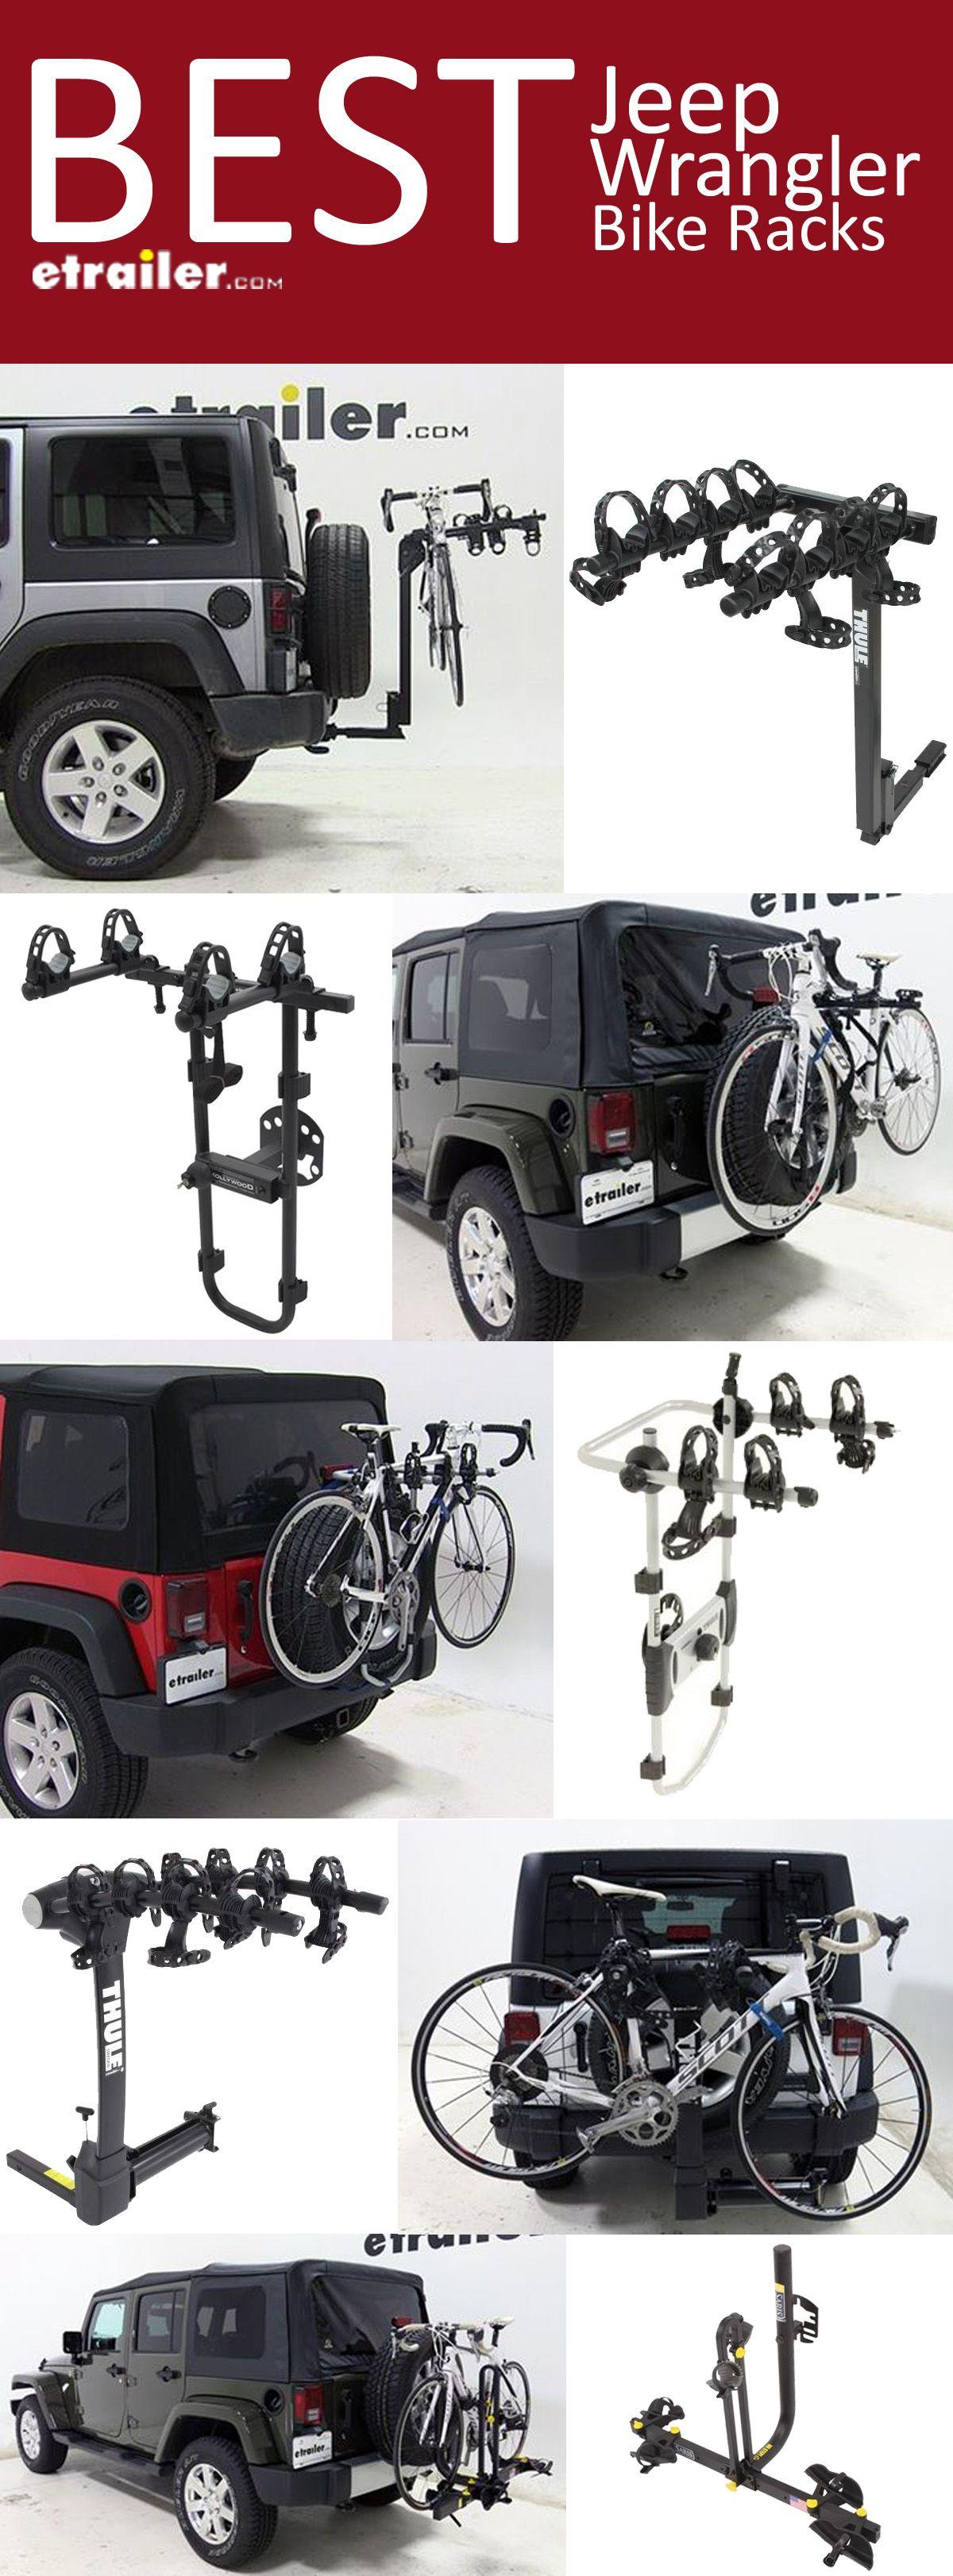 best jeep wrangler bike racks